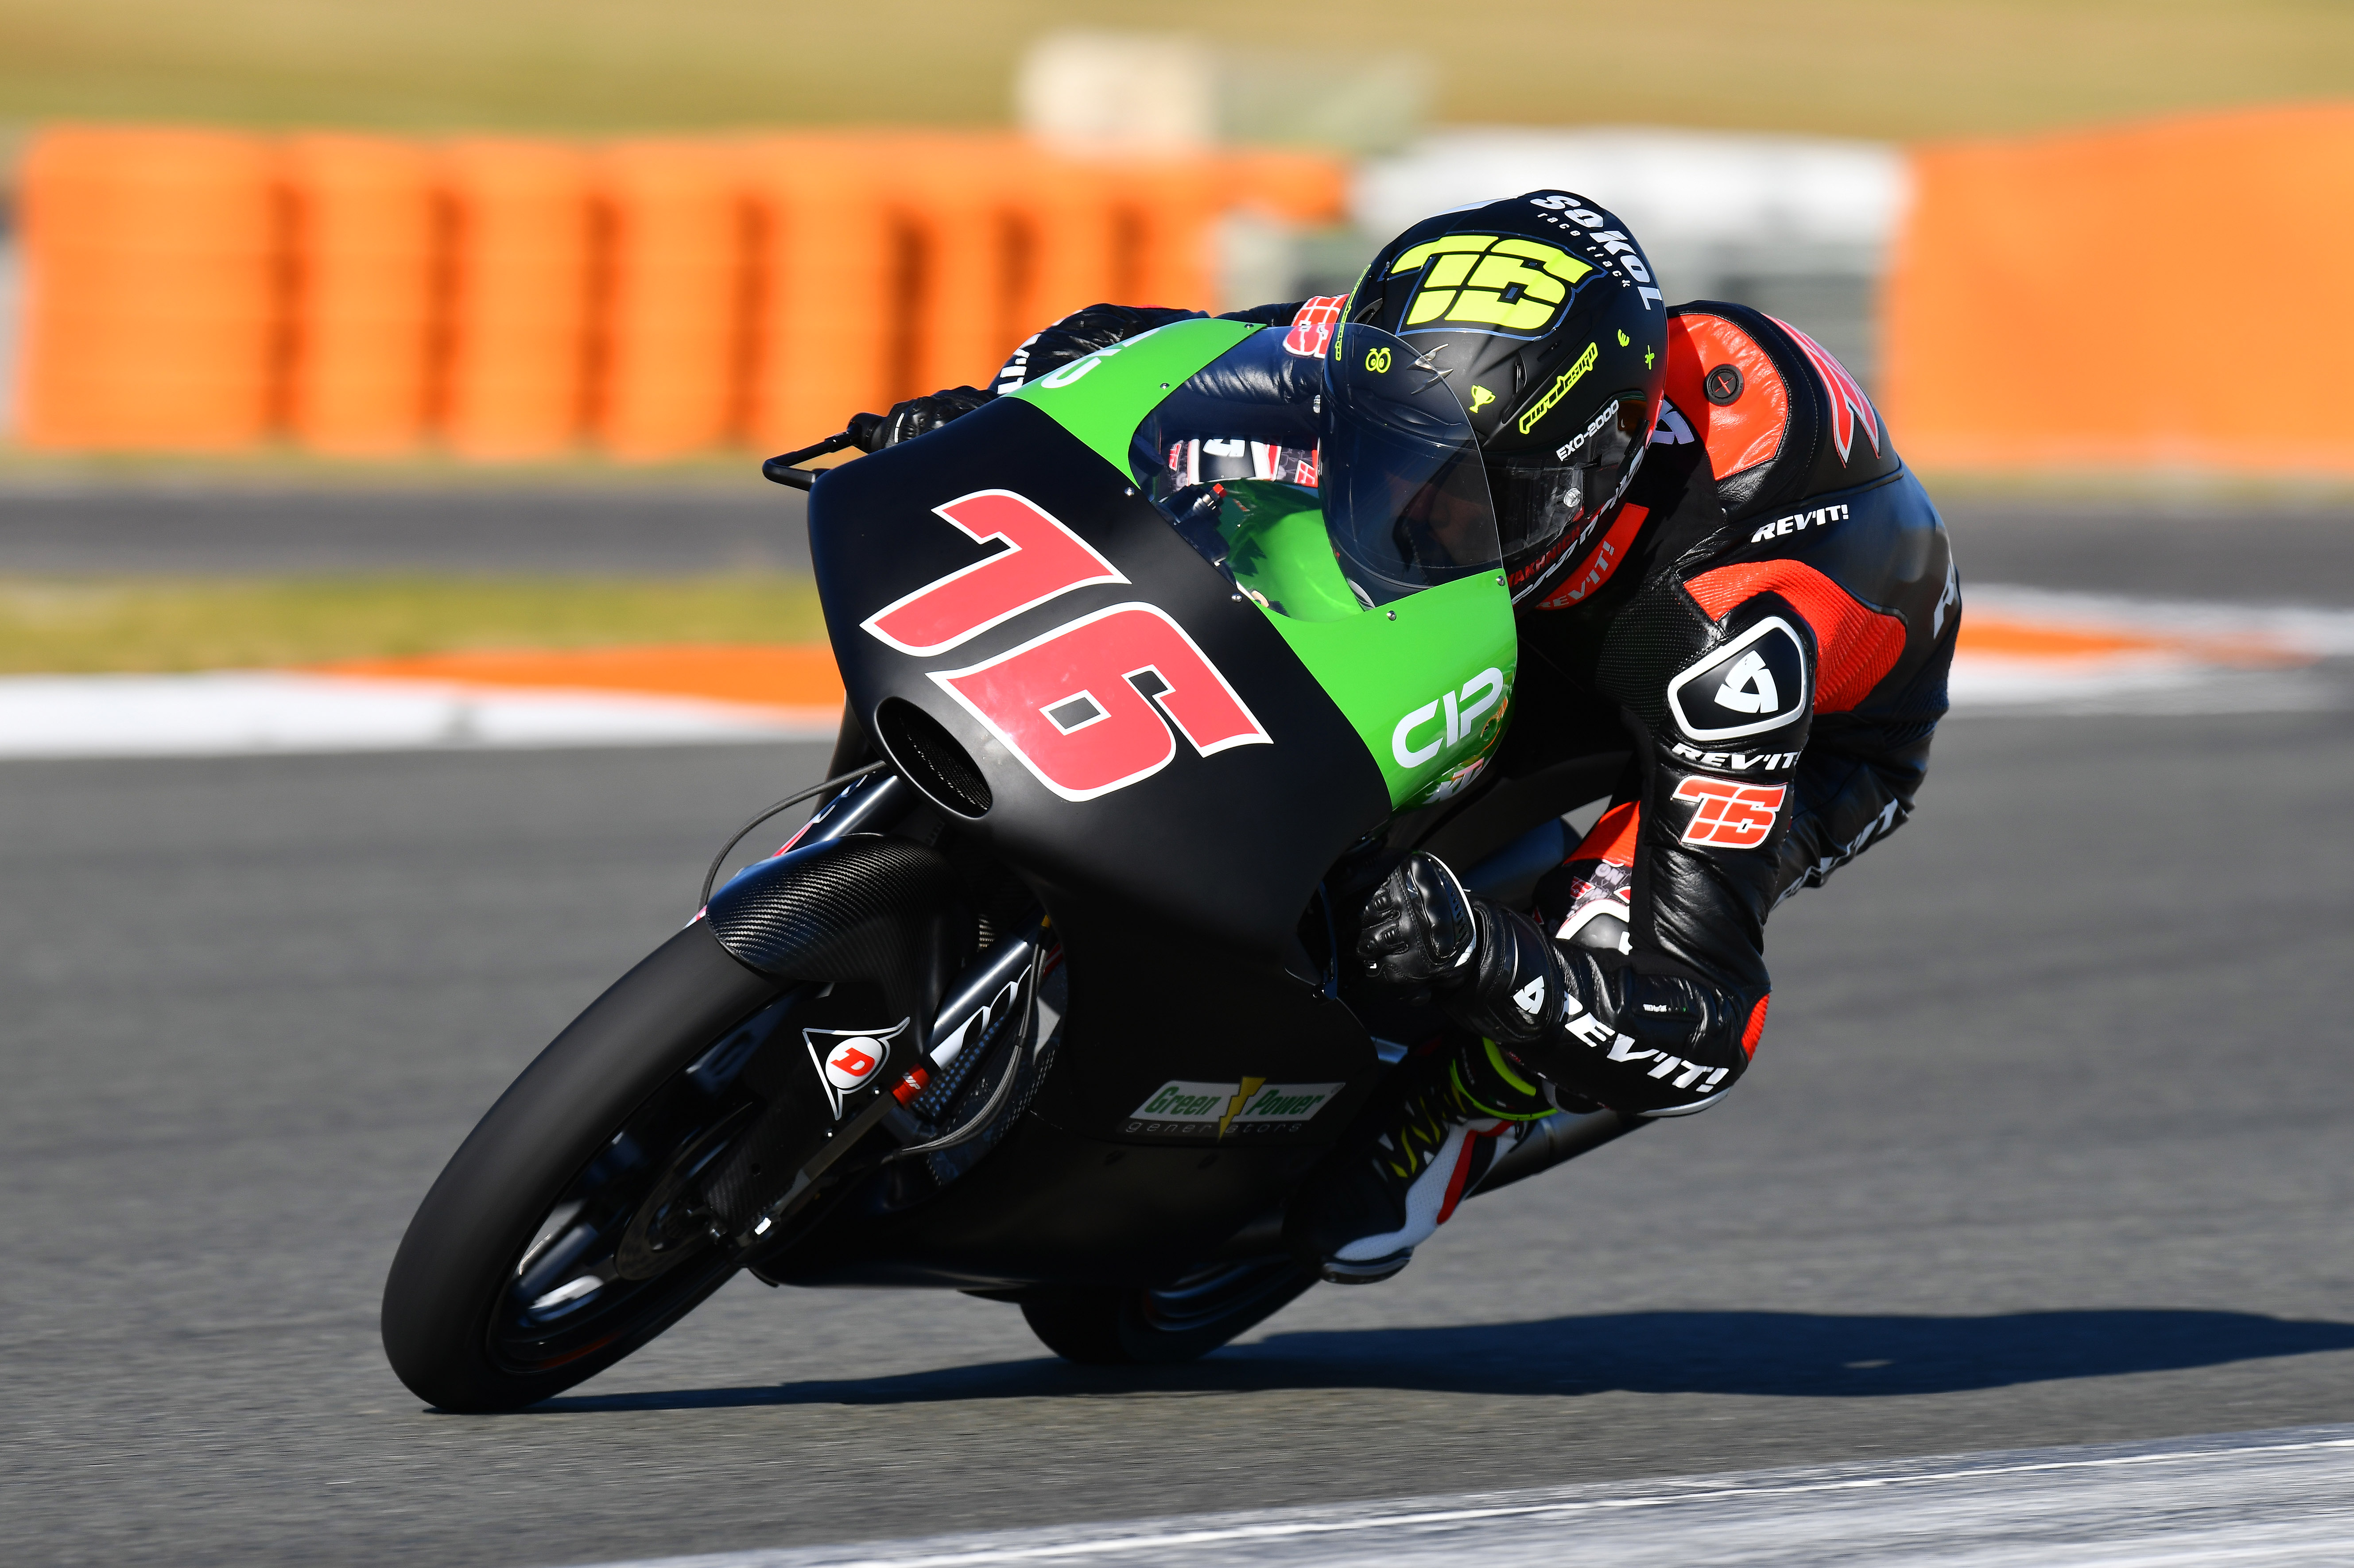 Makar Yurchenko KAZ CIP Green Power KTM Moto3  Test Valencia 2018 (Circuit Valencia) 06-08.02.2018